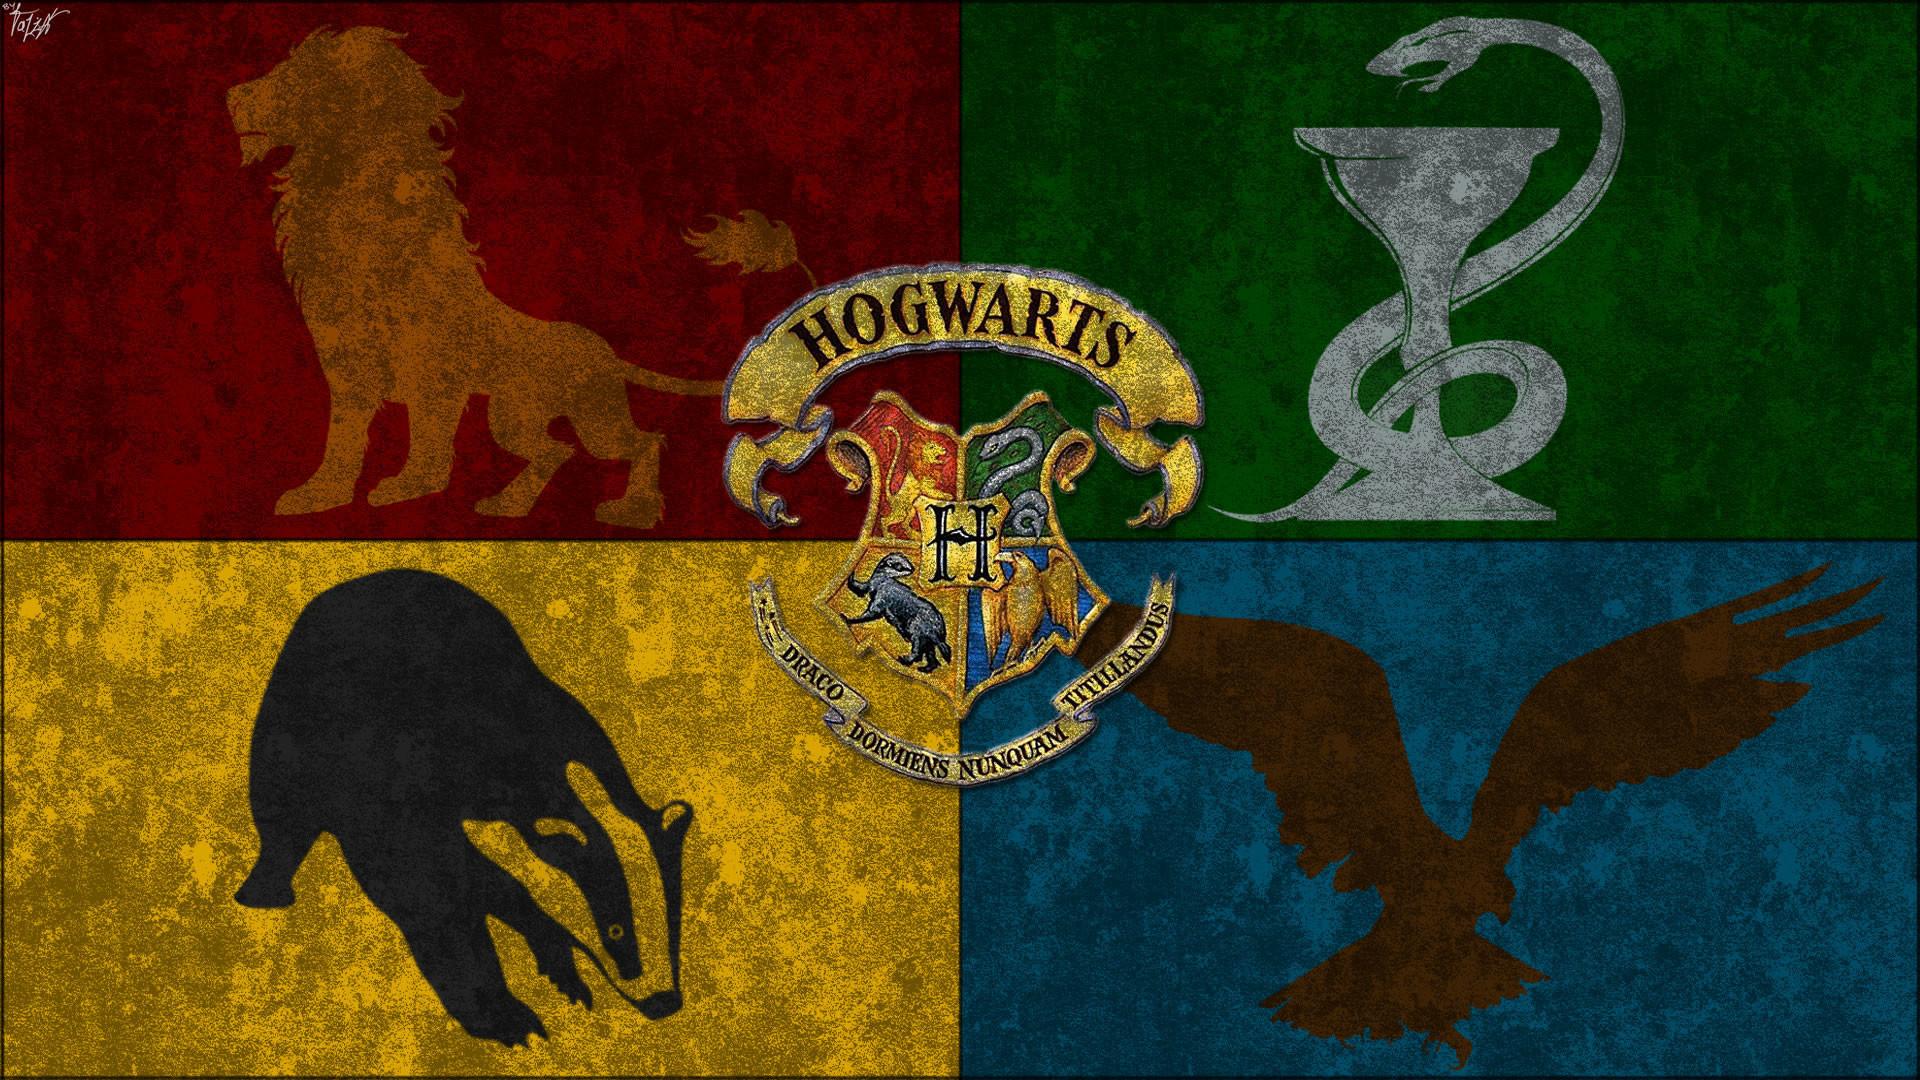 Res: 1920x1080, Hogwarts house wallpaper all by theladyavatar-d5fp057.jpg .